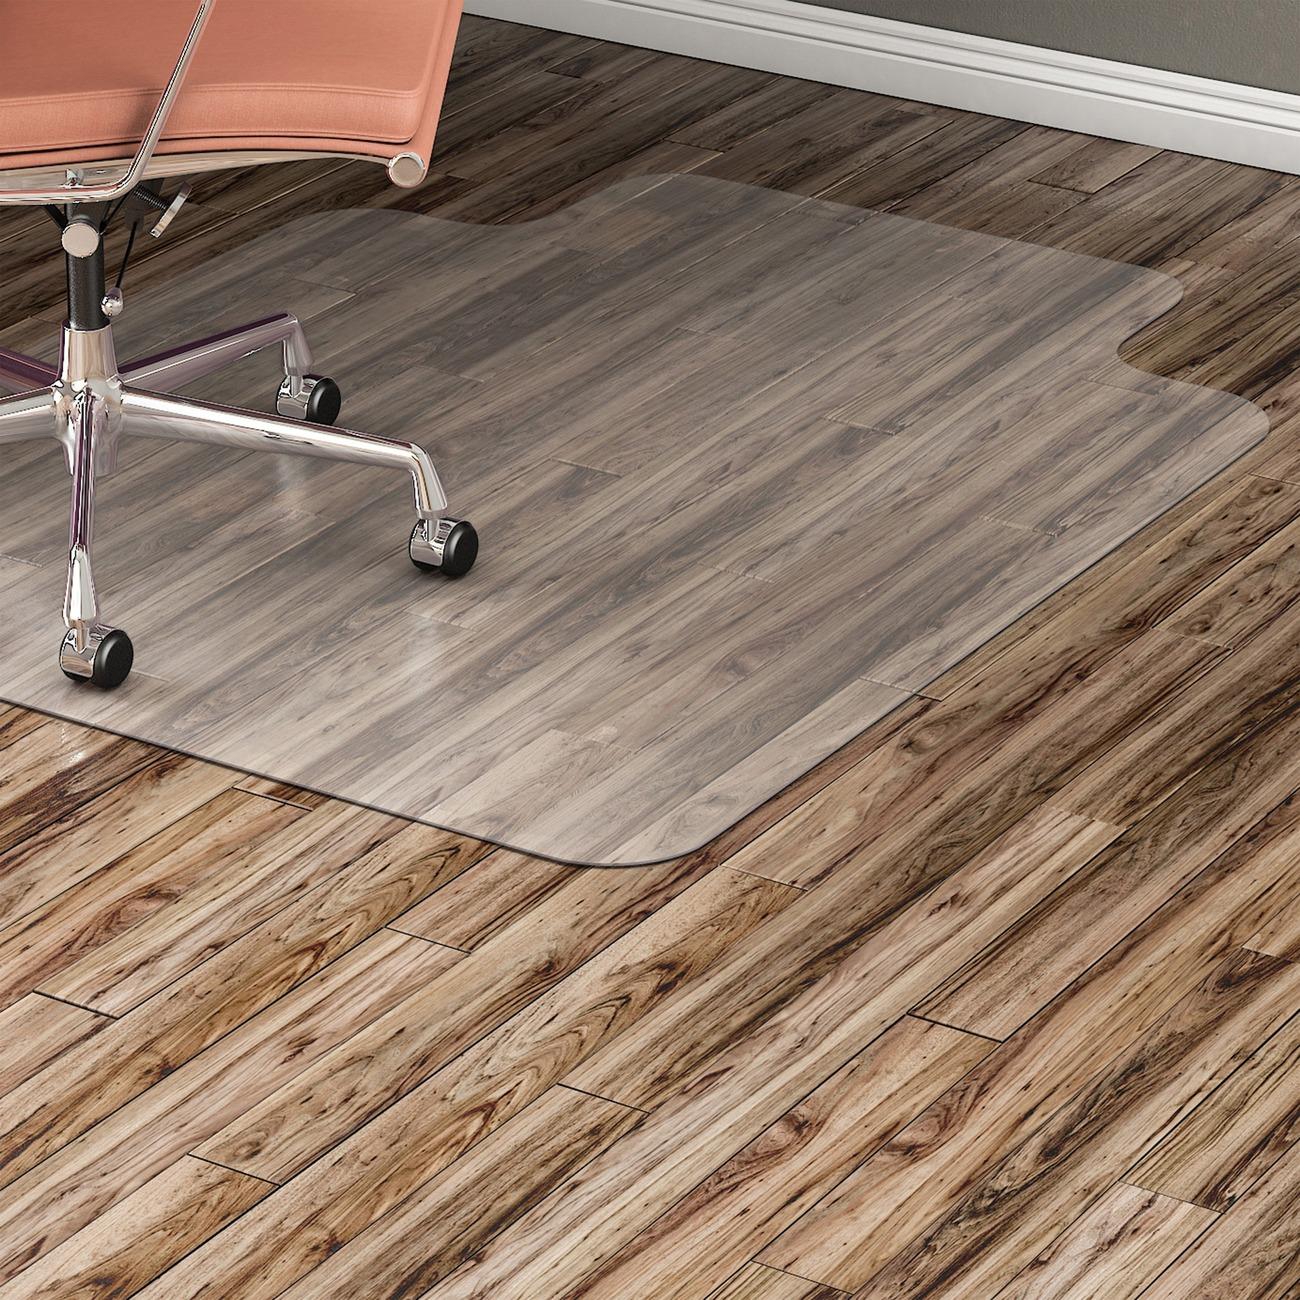 Lorell Hard Floor Wide Lip Vinyl Chairmat Wood Tile 53 1346 20 Mm Length X 45 1143 Width 95 Mil 2 41